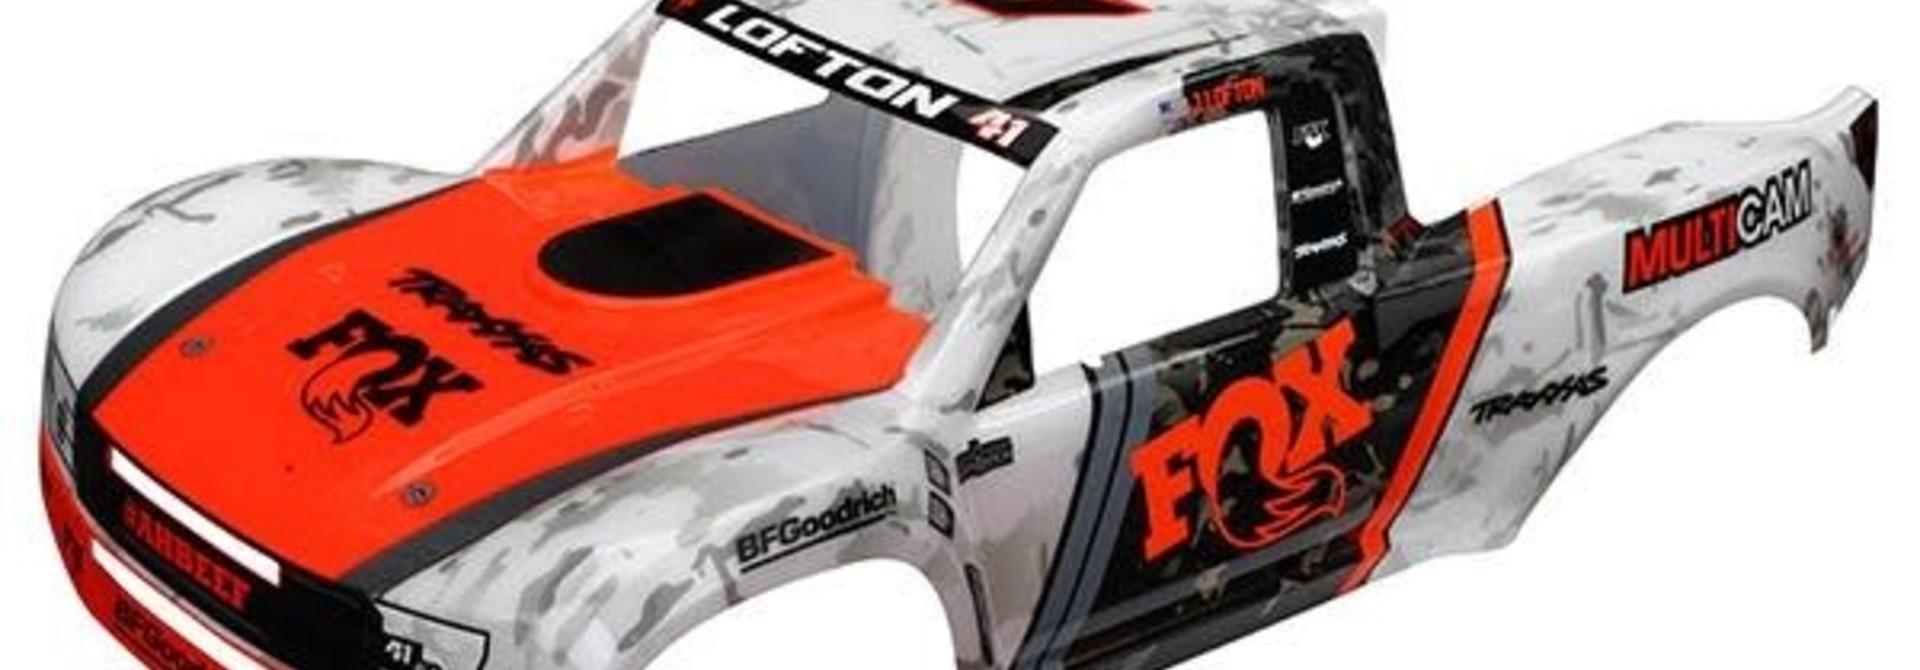 Body, Desert Racer, Fox Edition (painted)/ decals